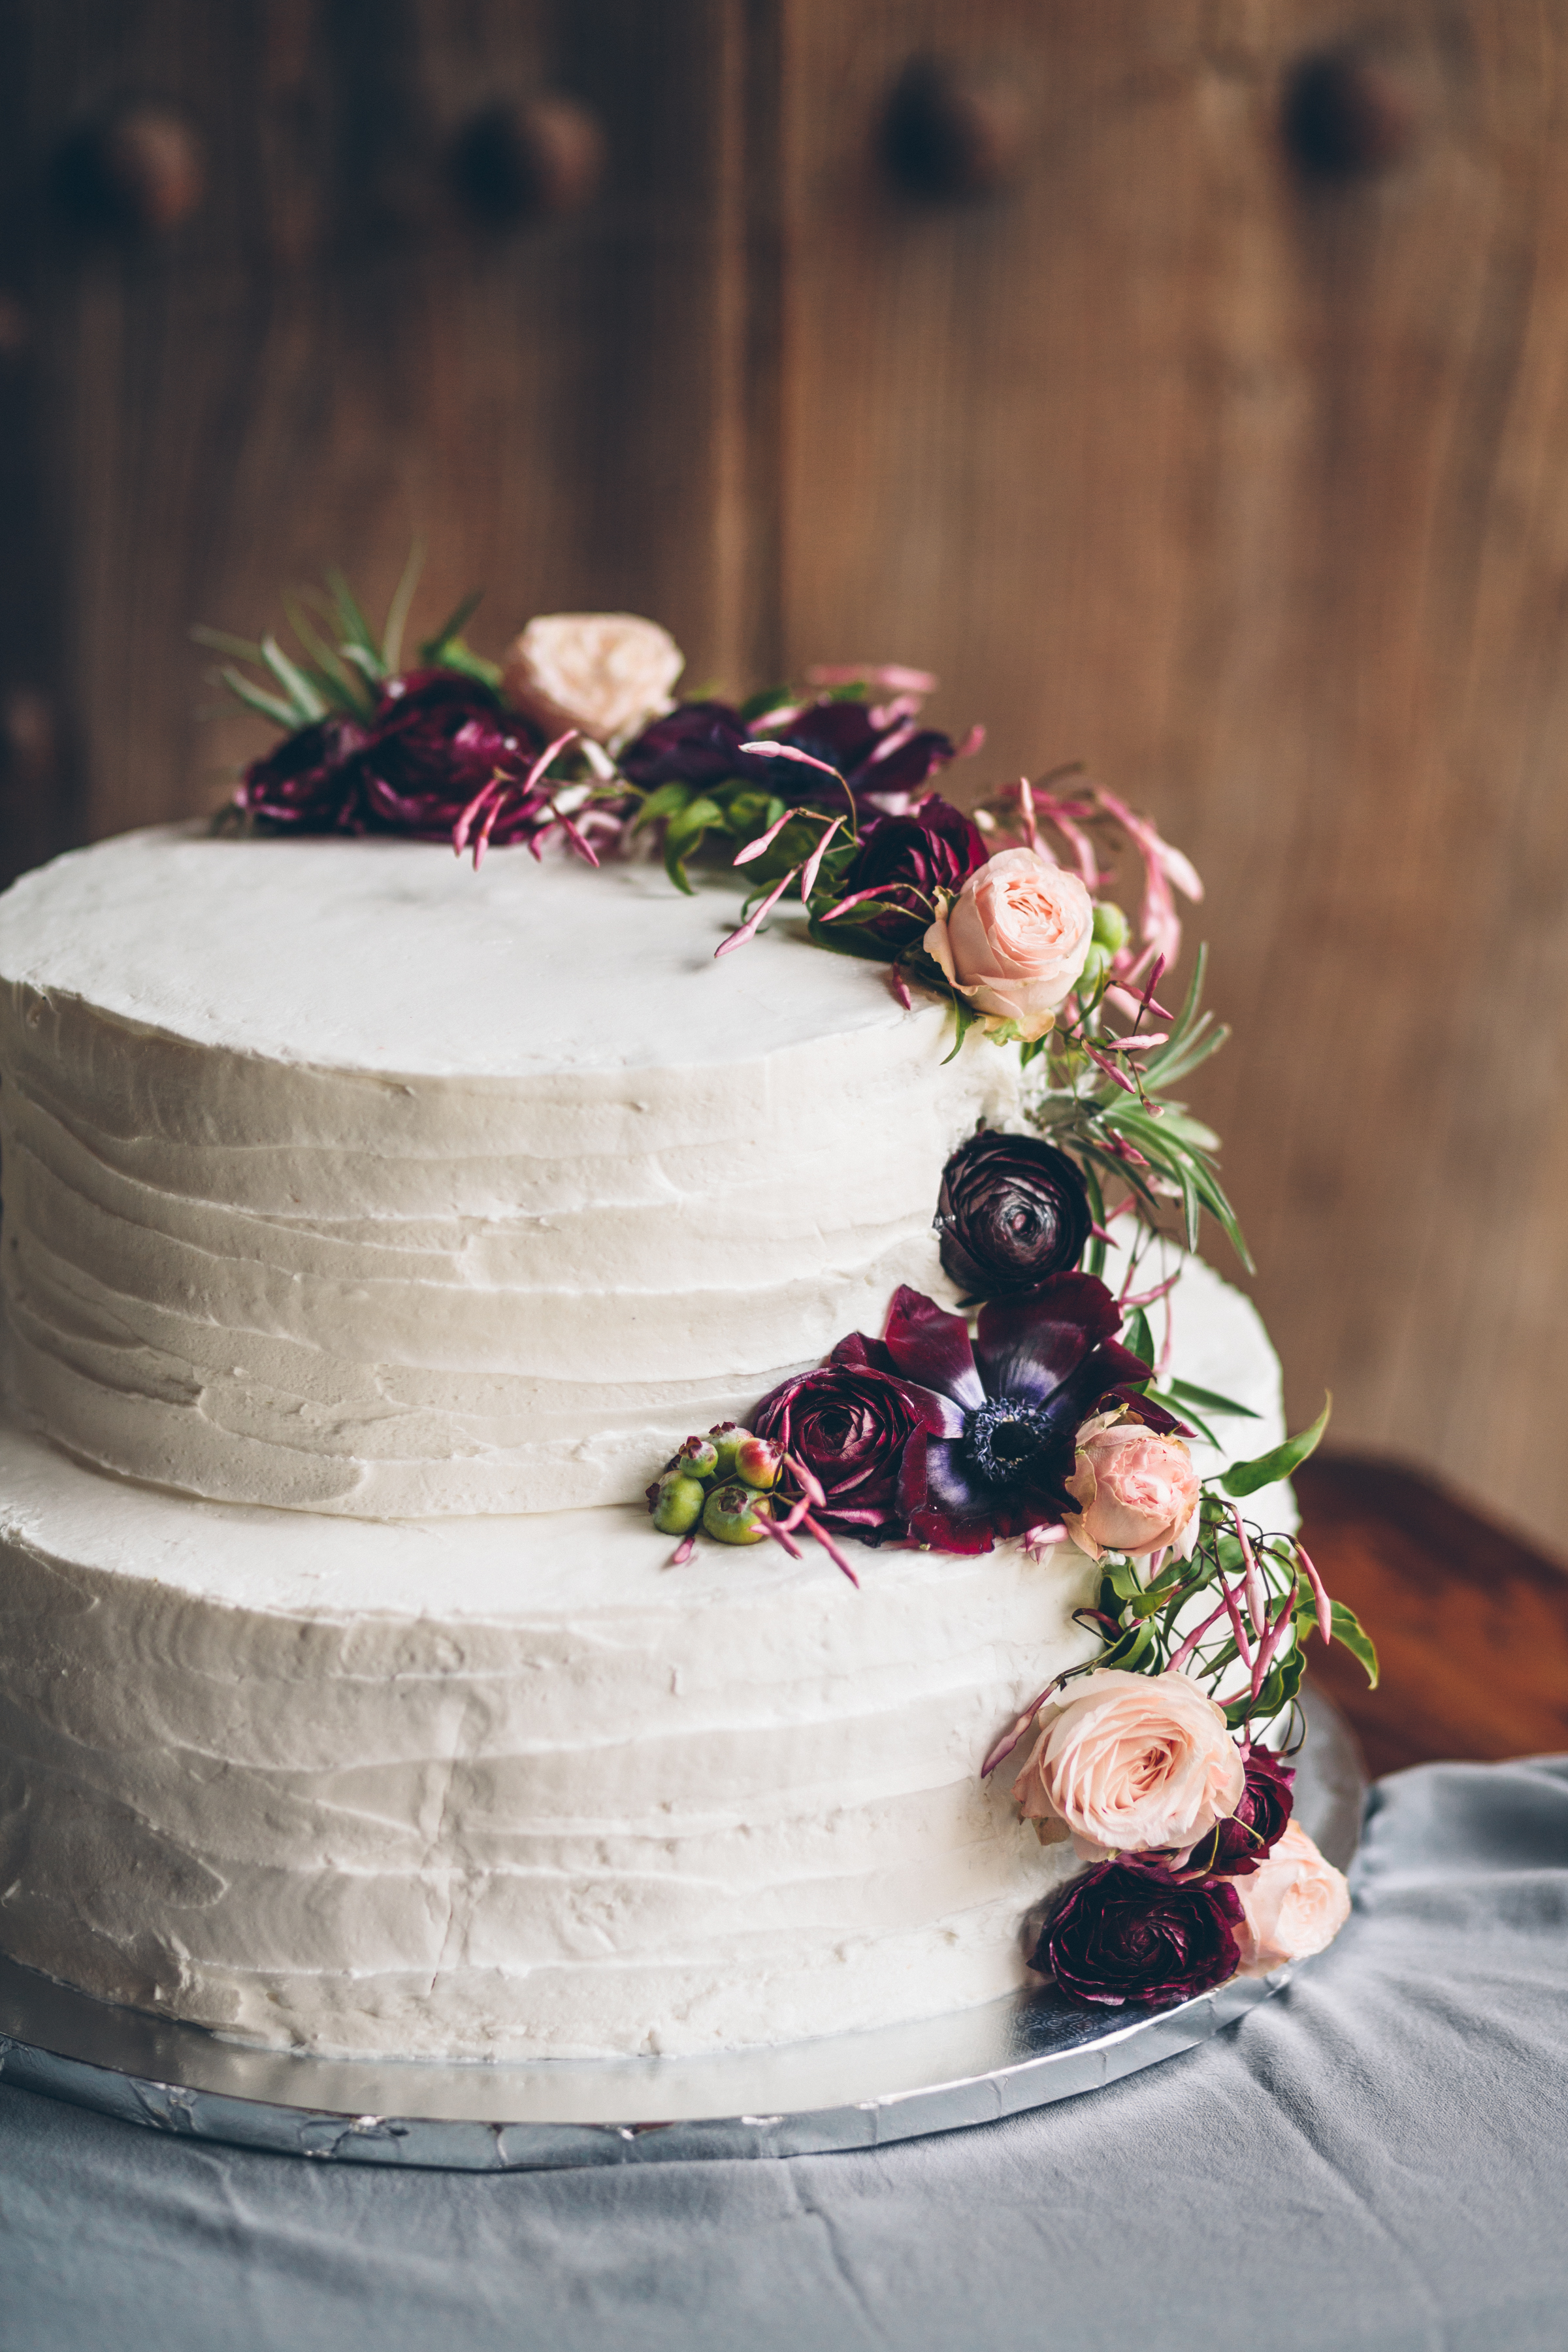 wedding cake with jasmine flowers.jpg